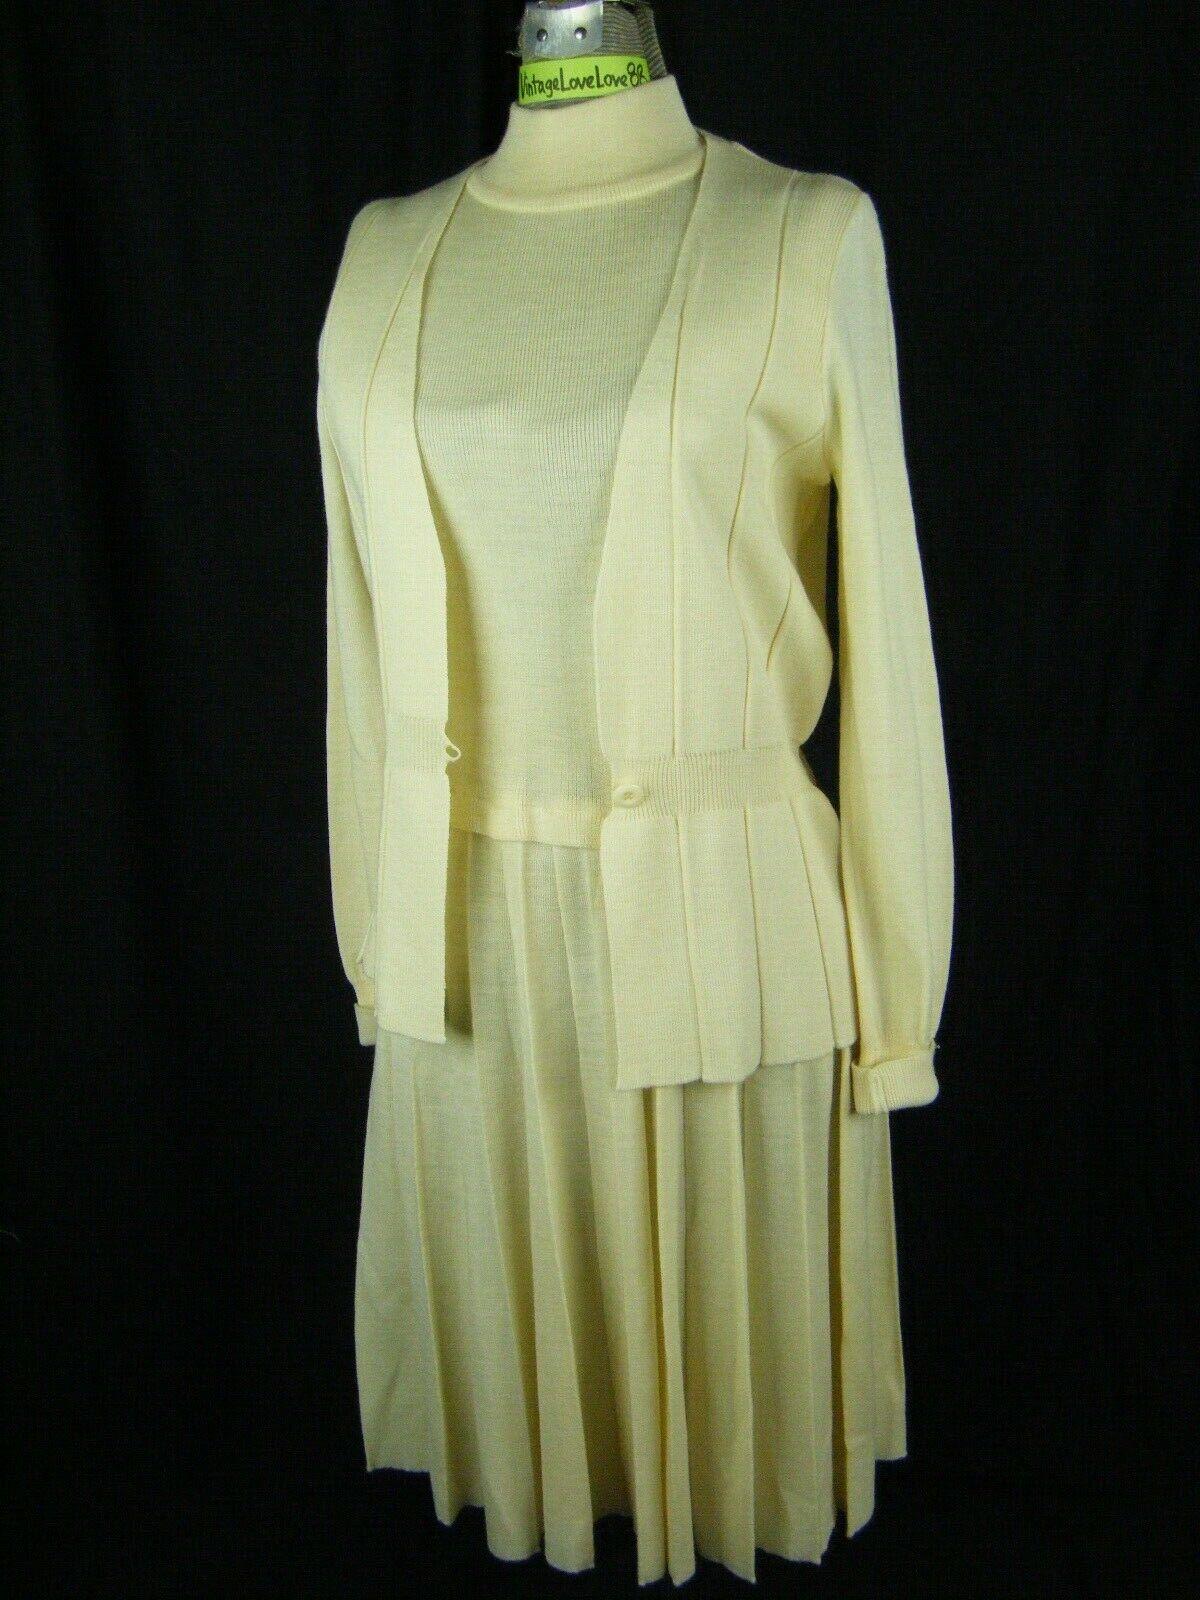 RONCELLI Vtg 70s Ivory Acrylic/Wool Sweater Dress… - image 1